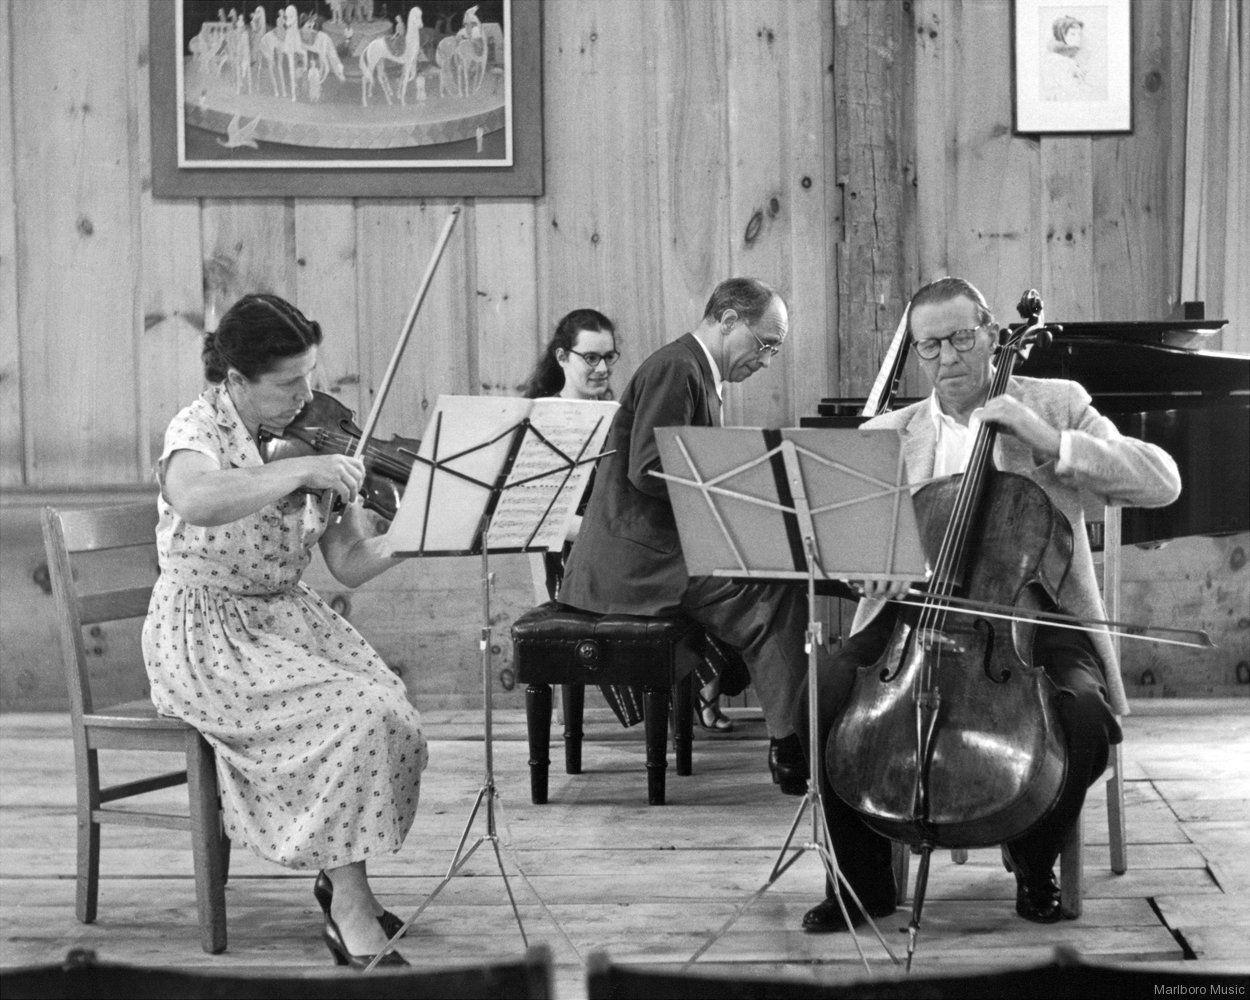 Blanche HONEGGER, Rudolf SERKIN et Hermann BUSCH à Malboro dans les années 1950